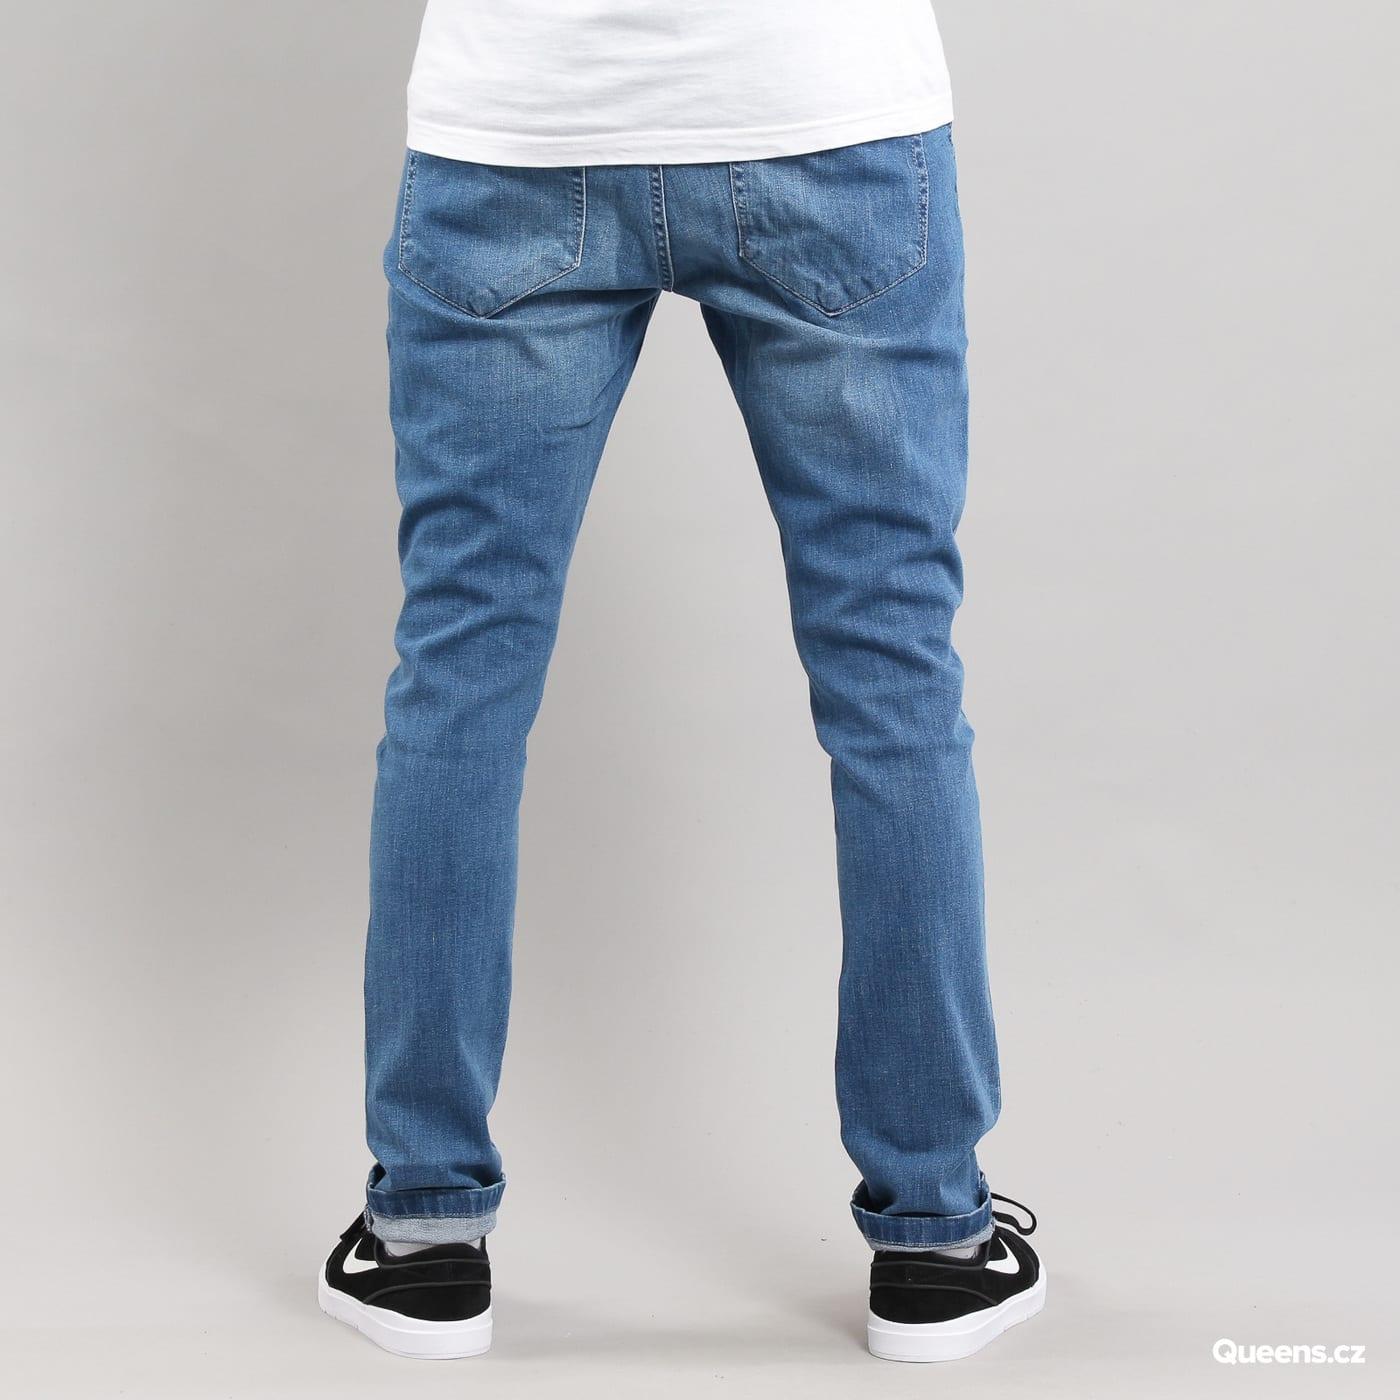 Urban Classics Slim Fit Knee Cut Denim Pant blau gewaschen